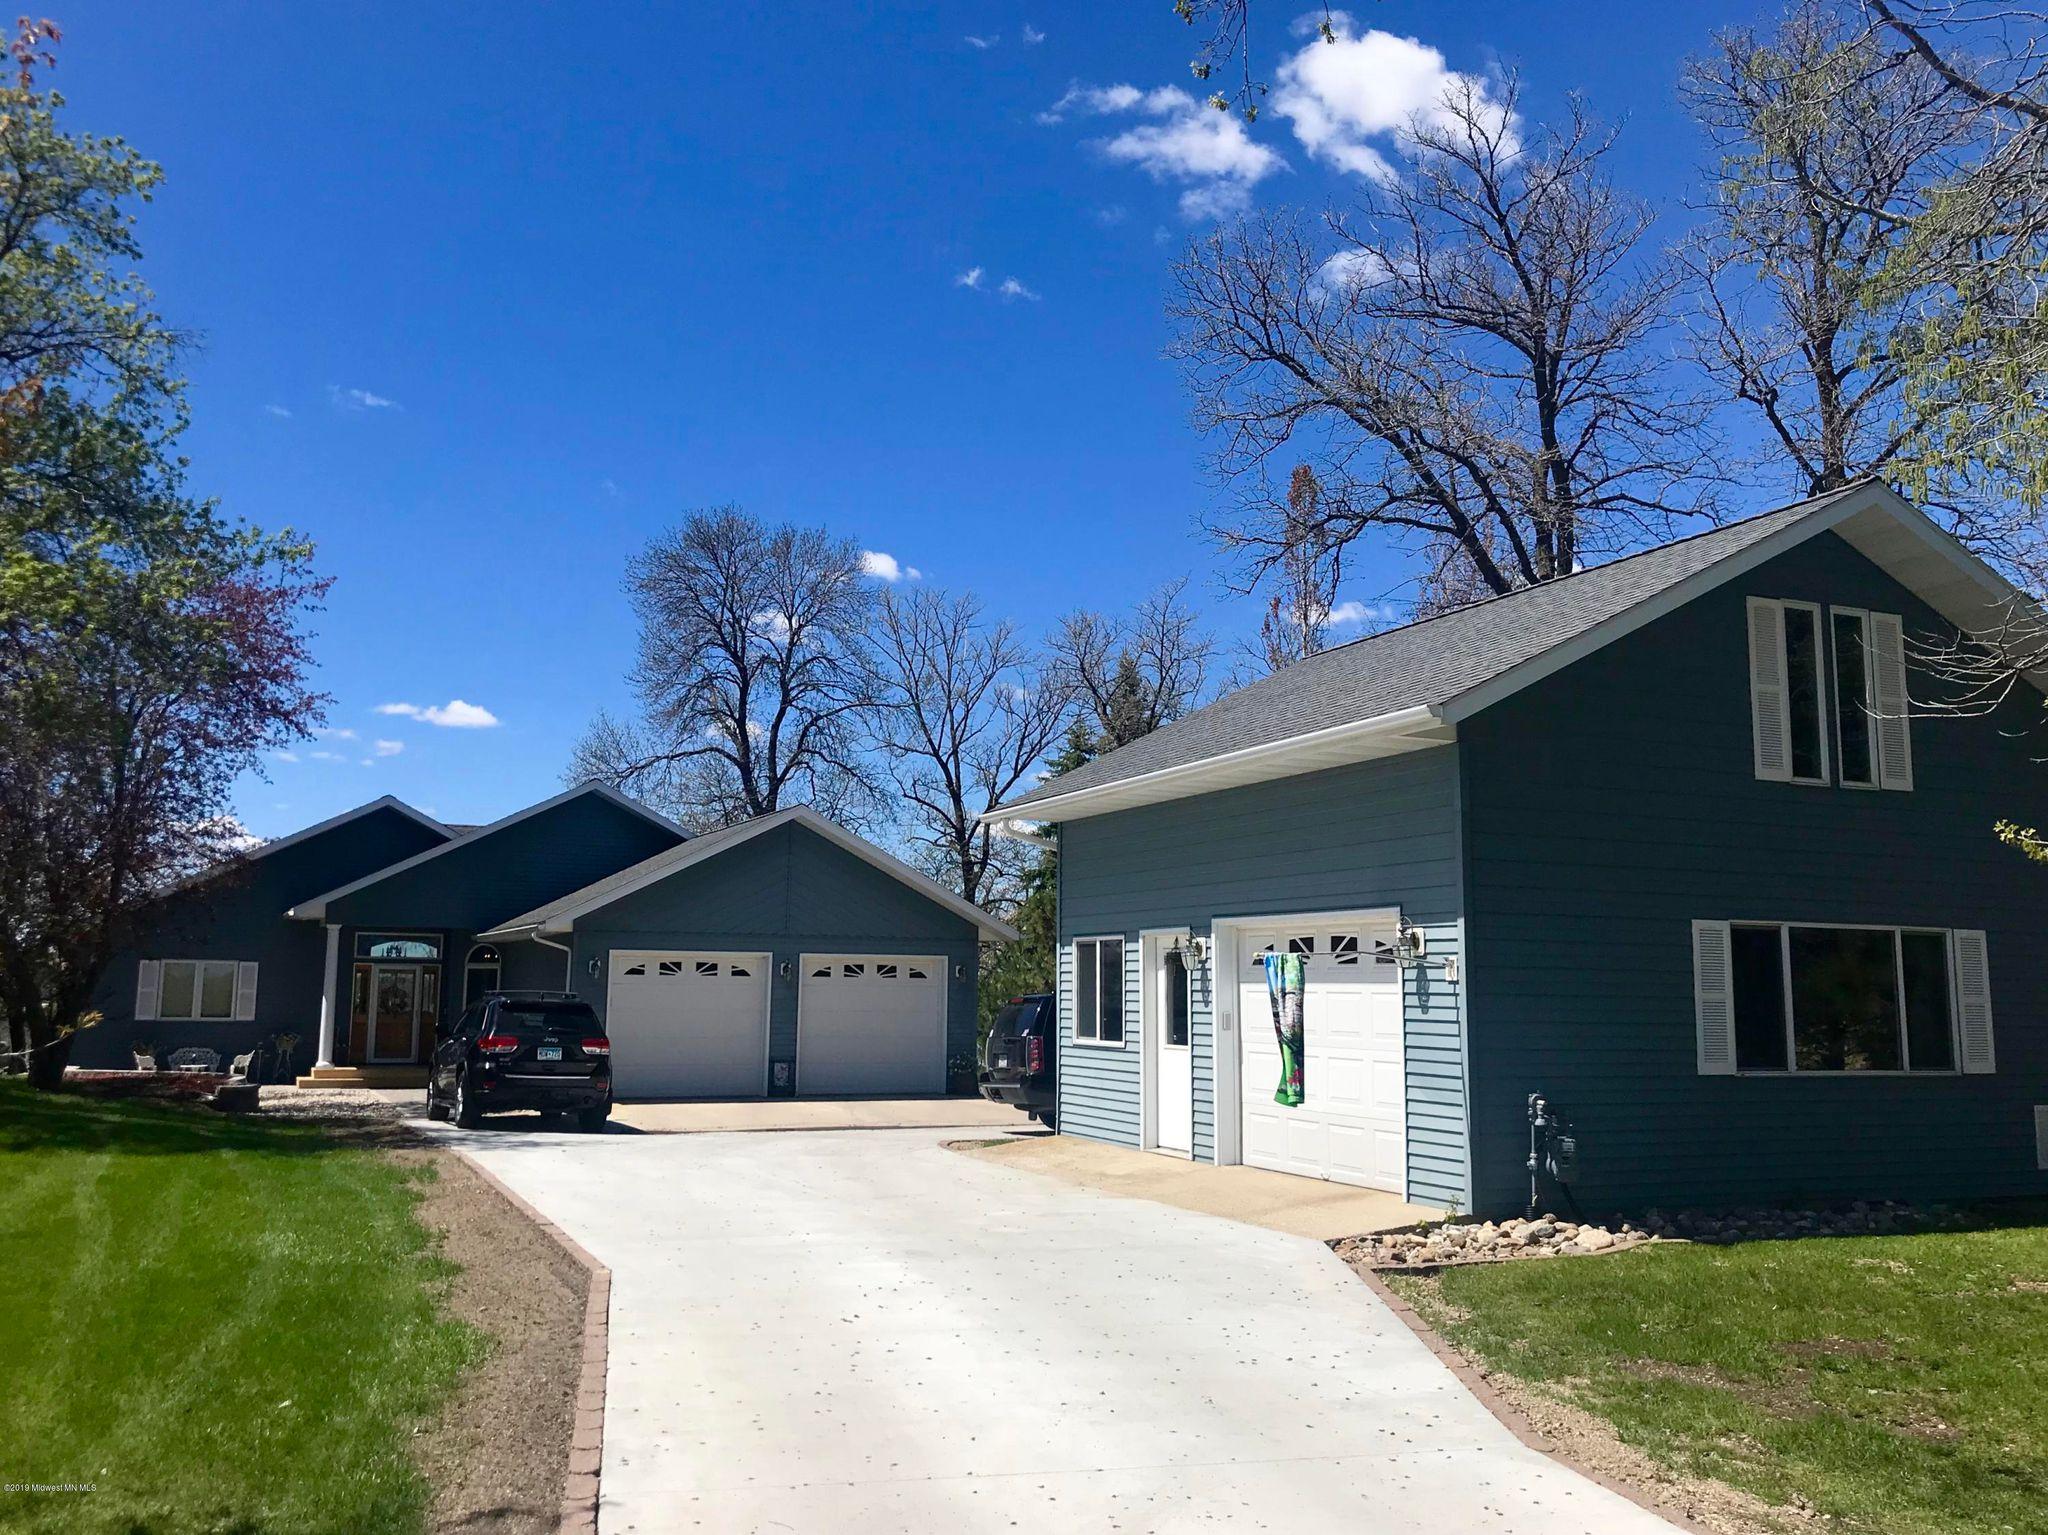 2268 Long Lake Rd, Detroit Lakes, MN 56501 - 4 Bed, 2 Bath Single-Family  Home - MLS #20-26179 - 44 Photos | Trulia